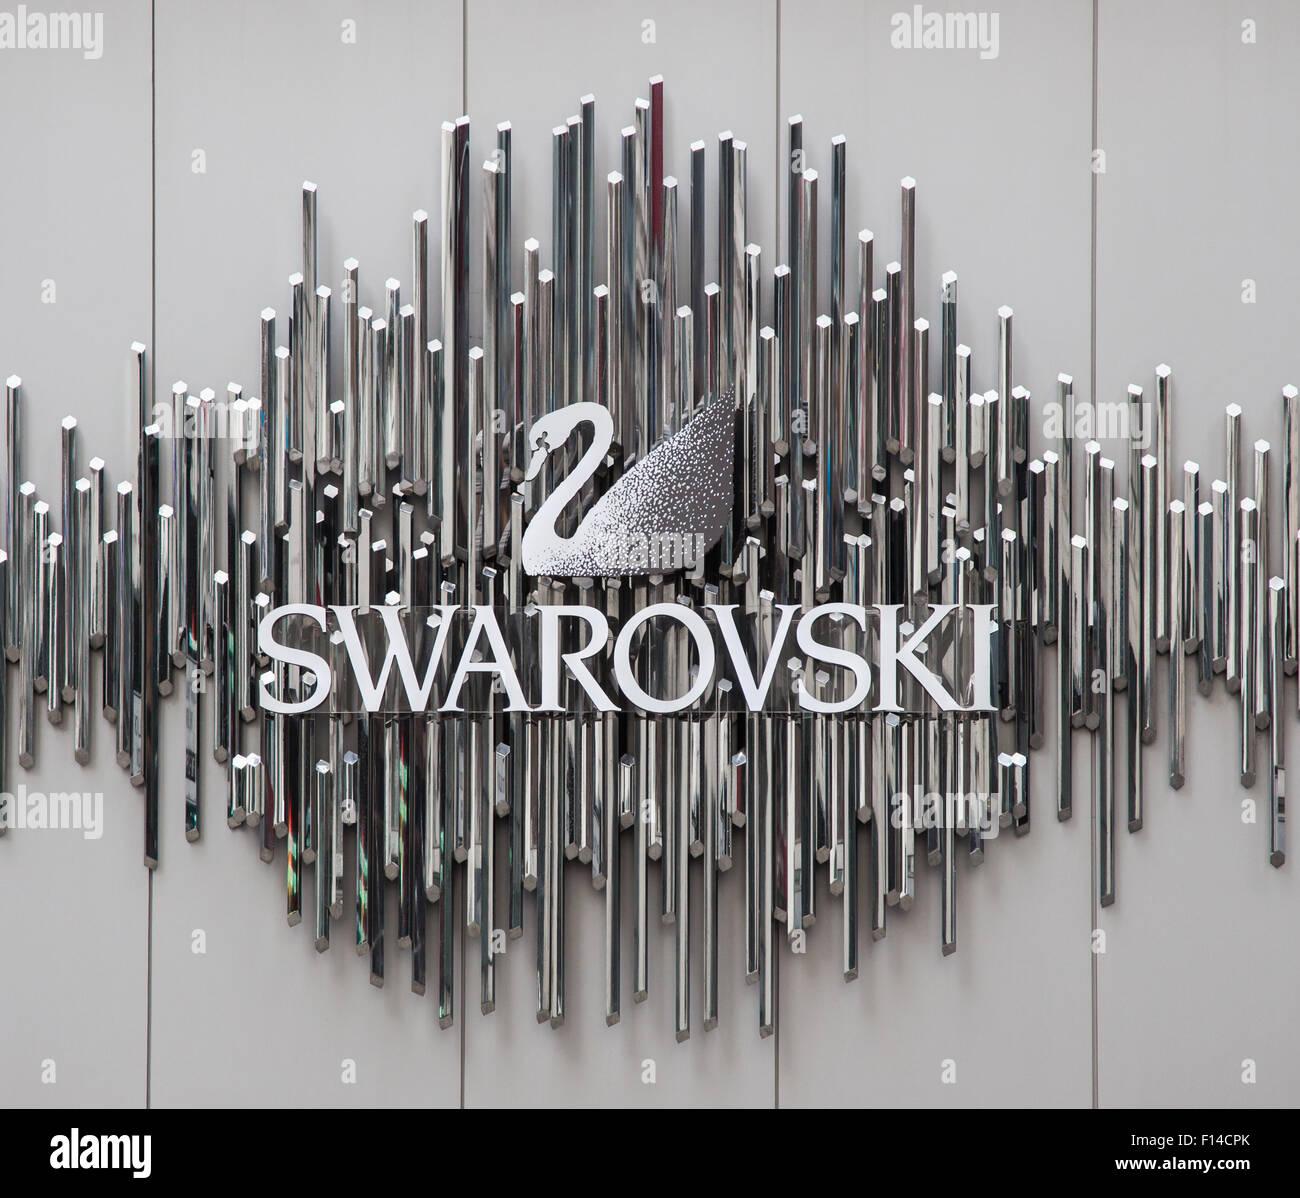 Swarovski brand on storefront in New York City Stock Photo - Alamy